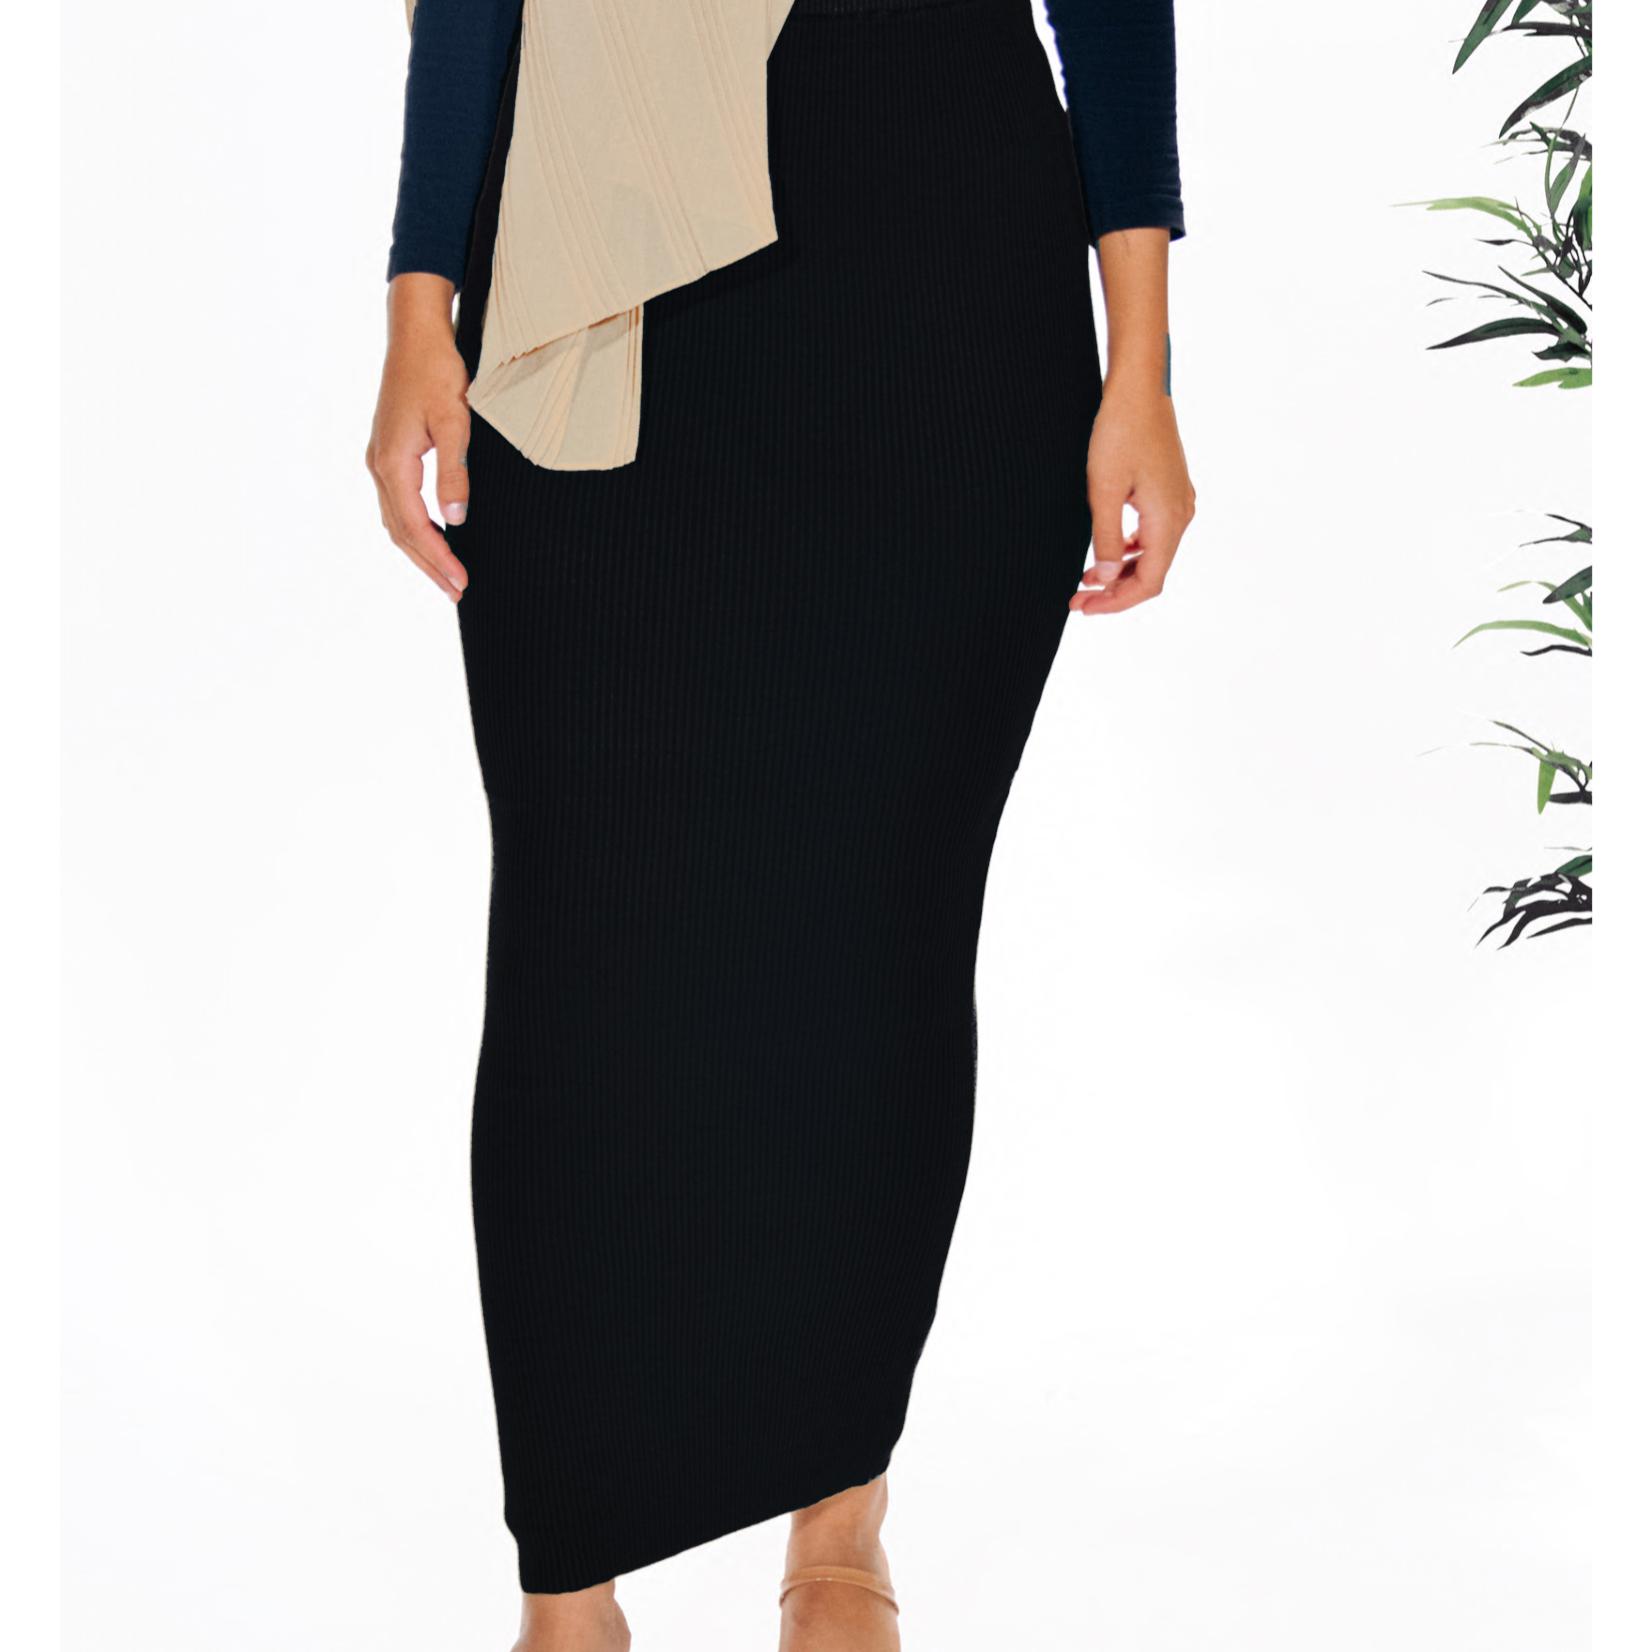 Nasiba Fashion Black Ribbed Skirt